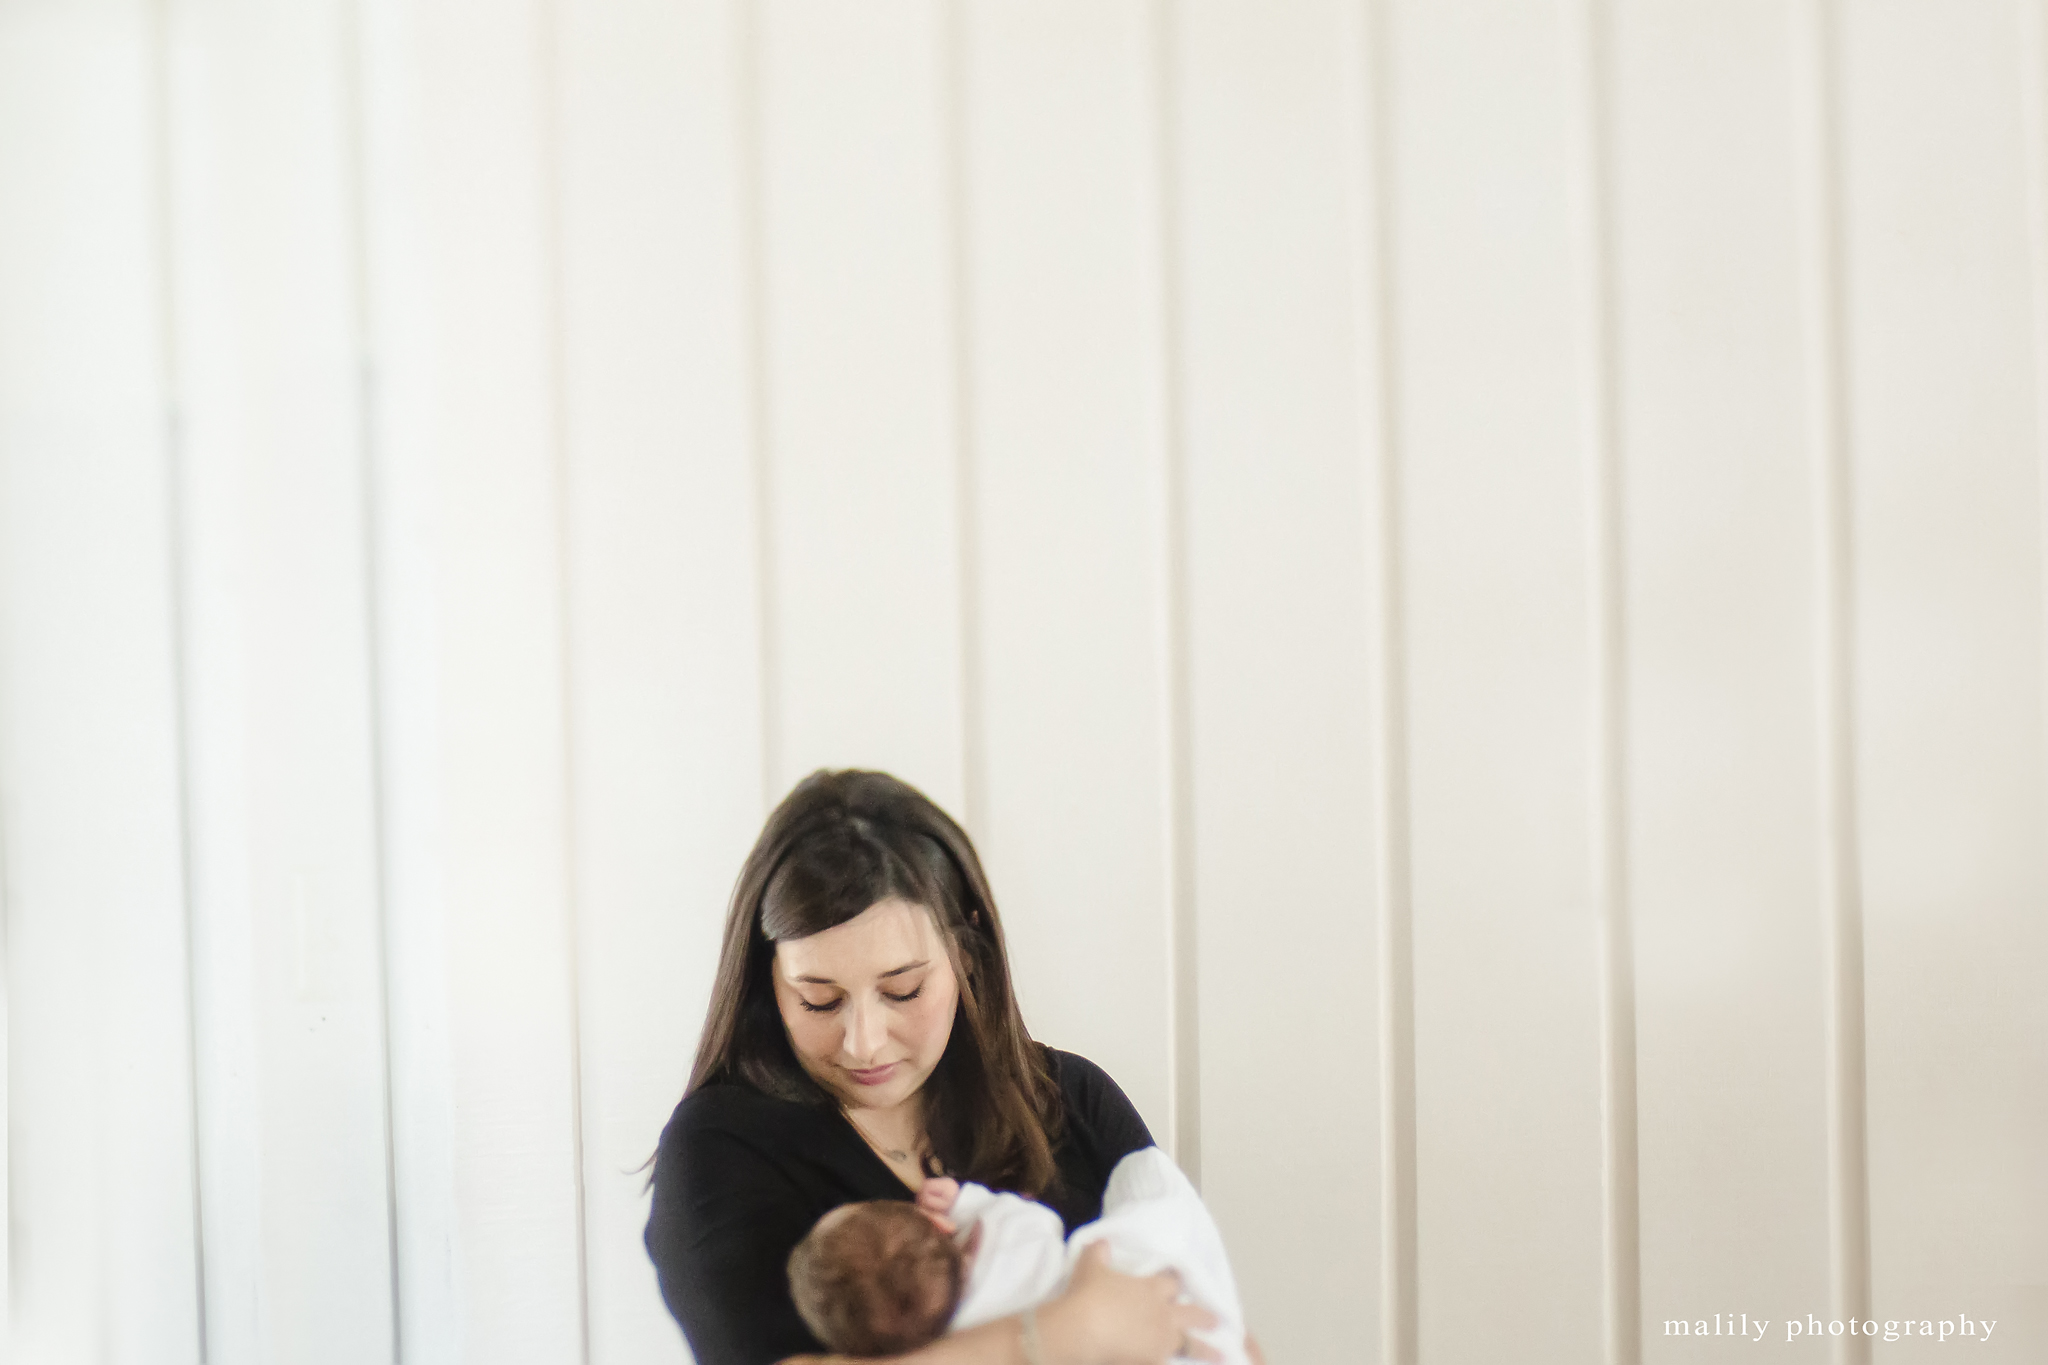 malily photography | orwigsburg newborn photographer